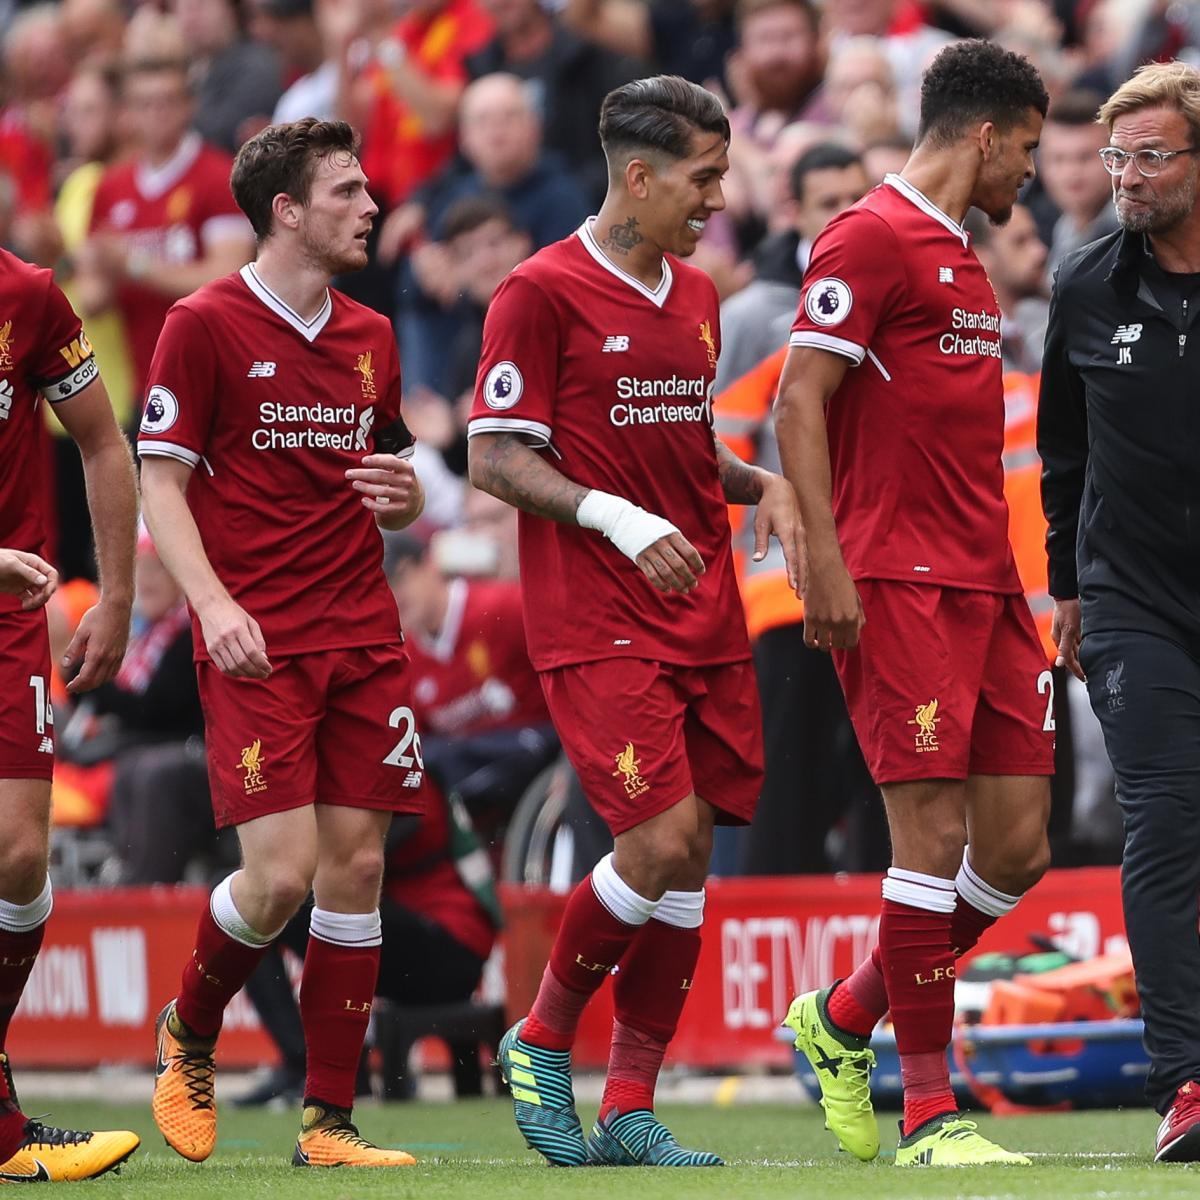 Live Streaming Soccer News Liverpool Vs Benfica Live: Liverpool Vs. Burnley FC: Team News, Preview, Live-Stream